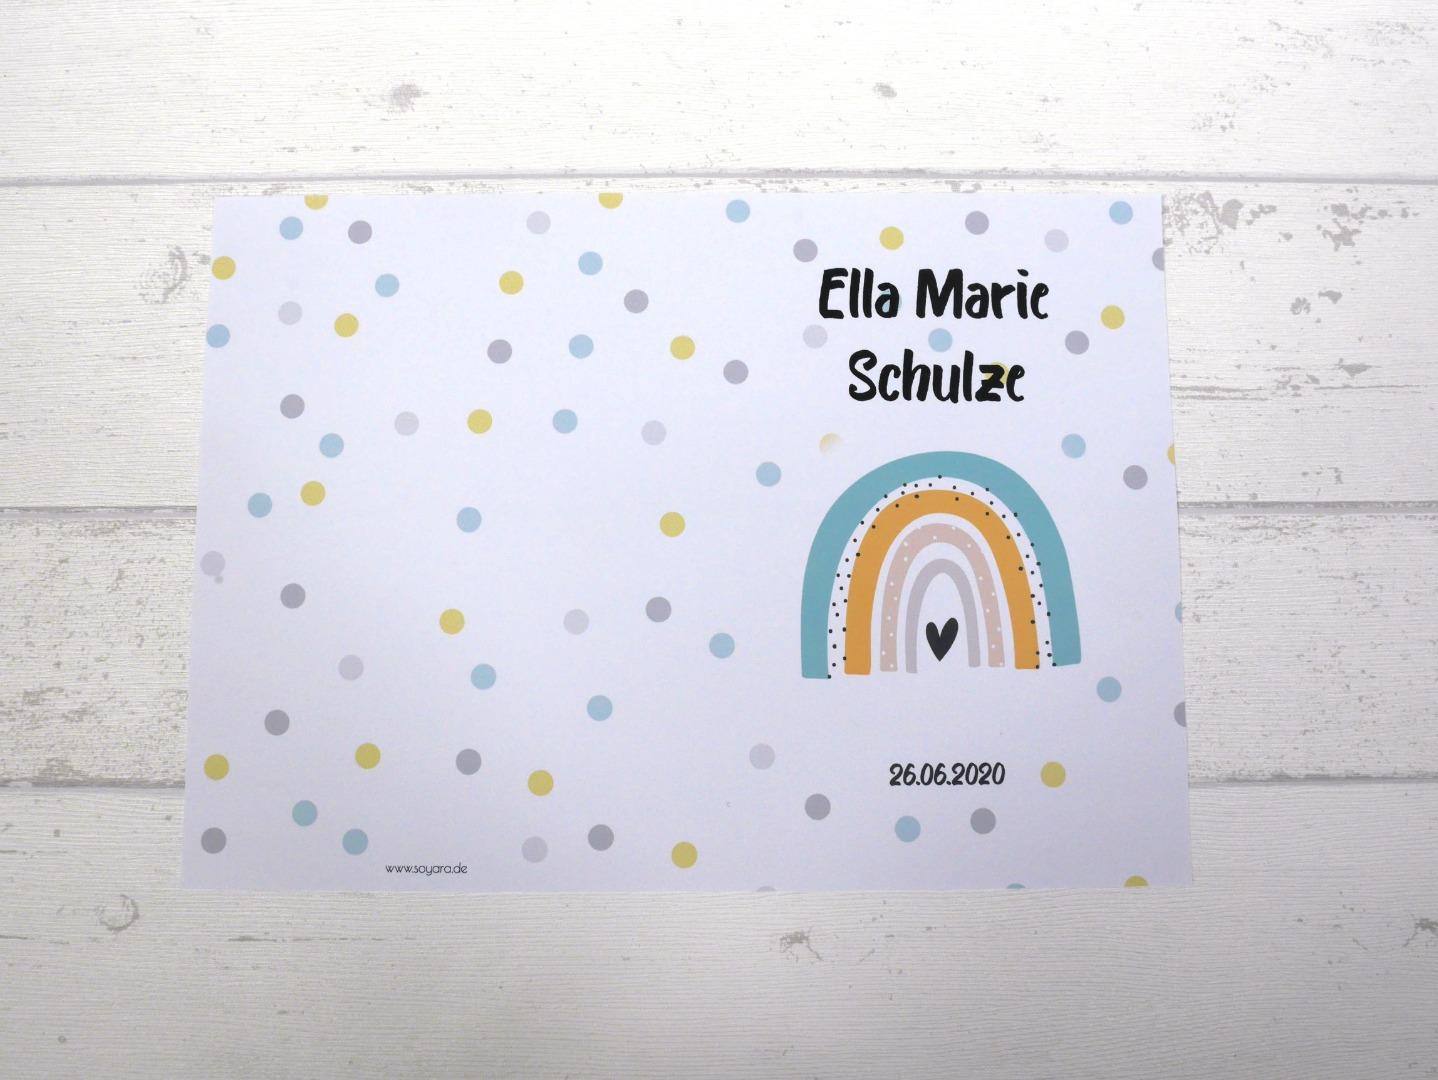 U-Heft Hülle Regenbogen mit Impfpass Hülle